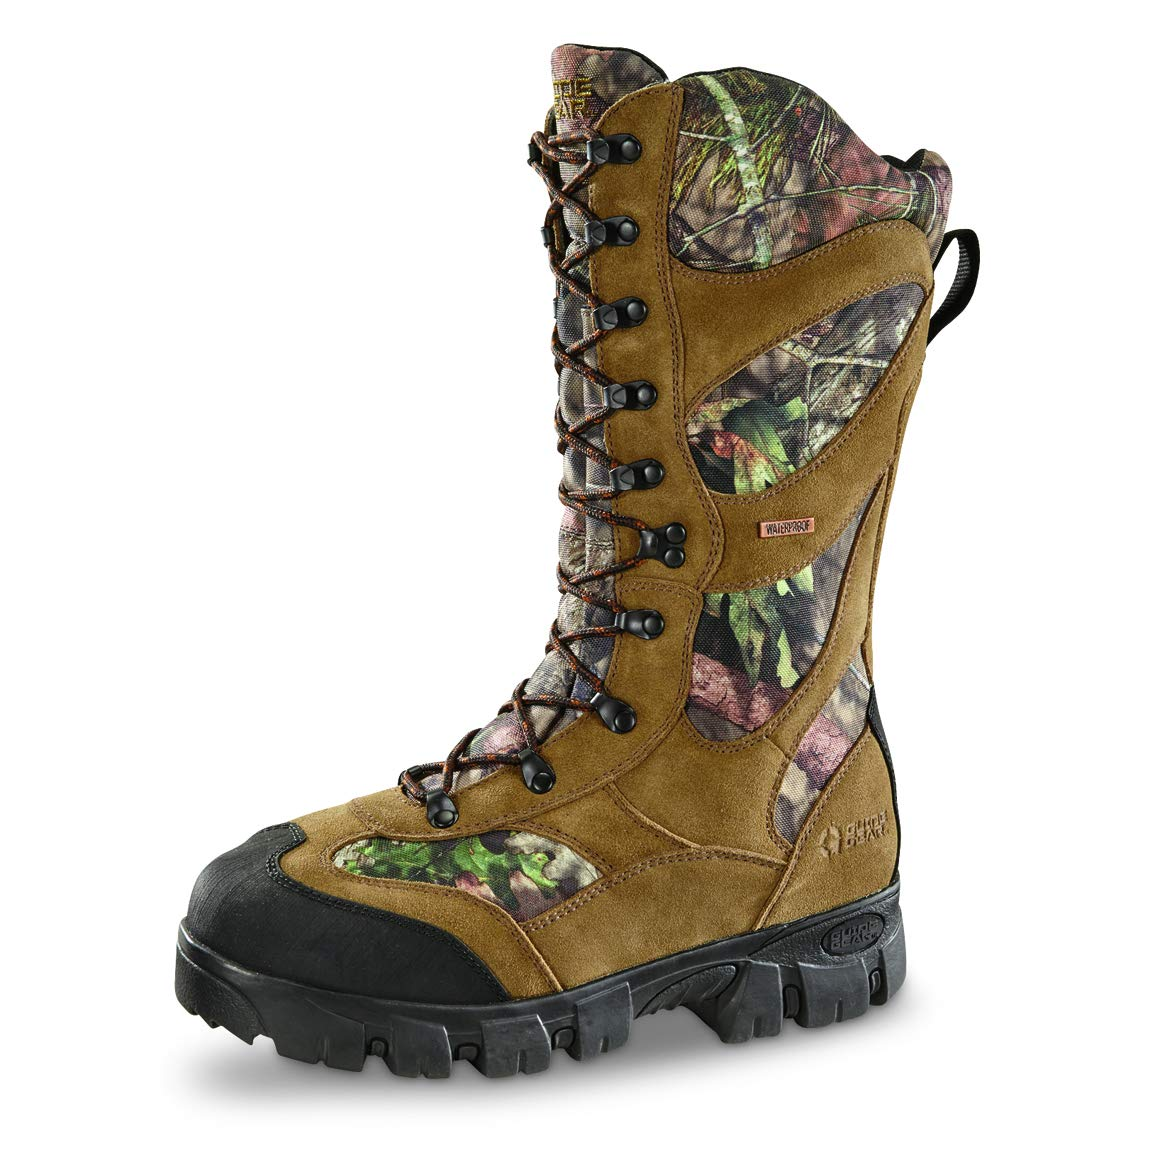 9cf74e76326 Guide Gear Giant Timber II Men'sInsulated Waterproof Hunting Boots,  1,400-gram, Mossy Oak